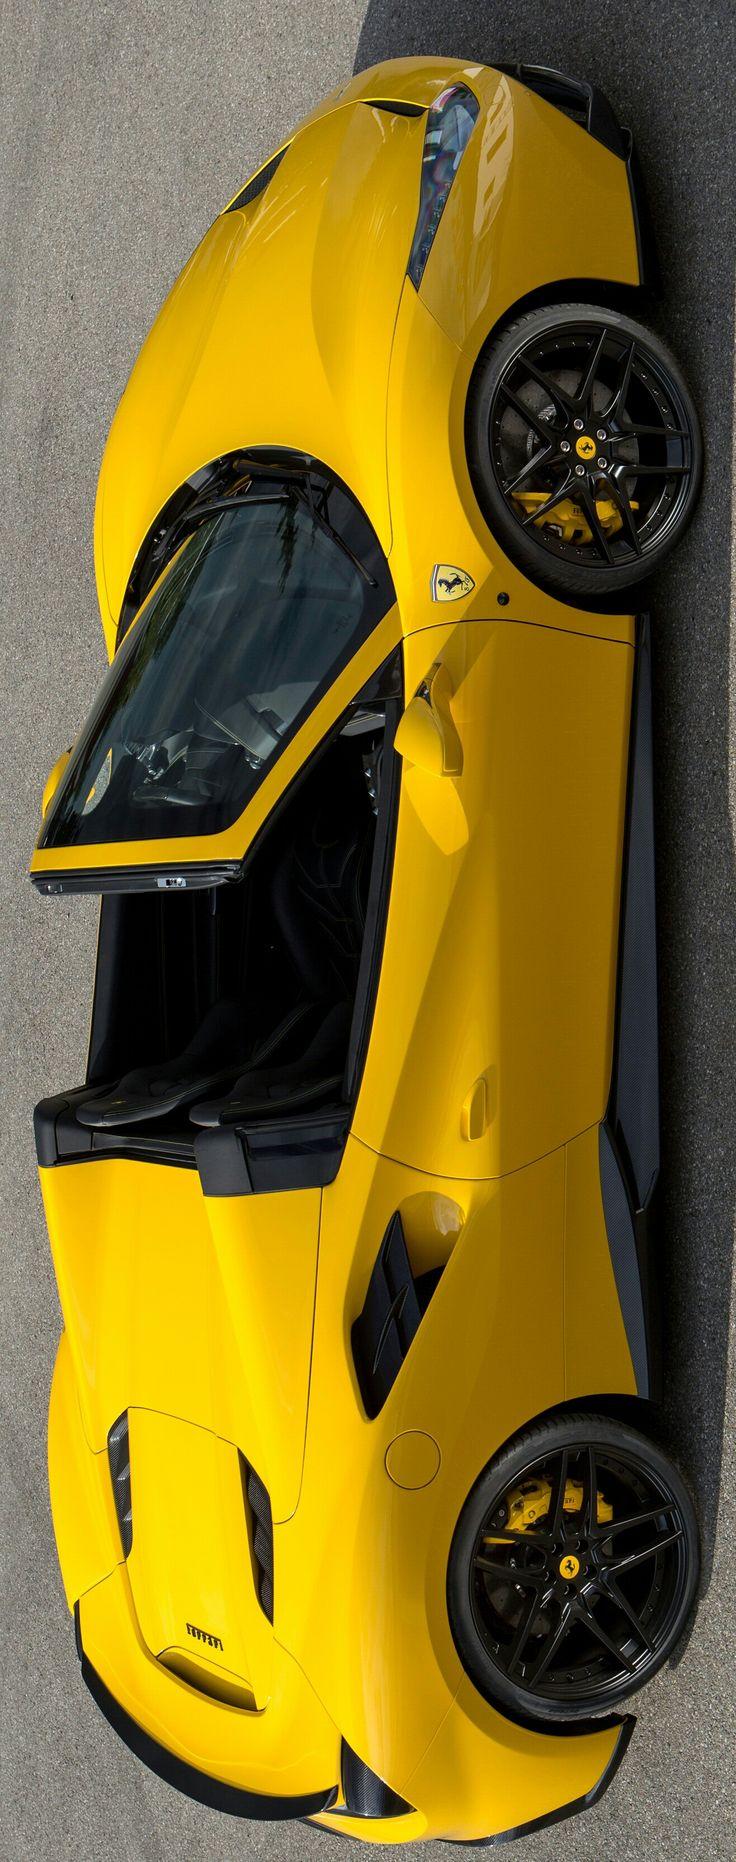 2016 Novitec Rosso Ferrari 488 Spider by Levon